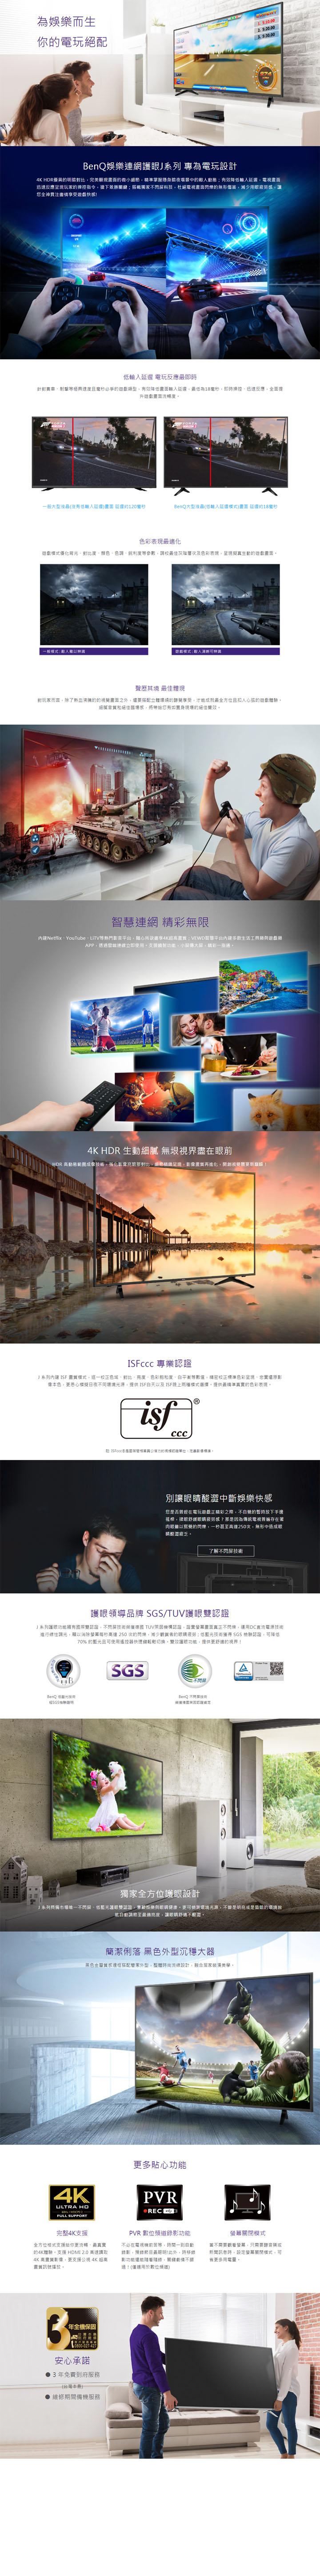 BenQ_J50-700_spec.jpg